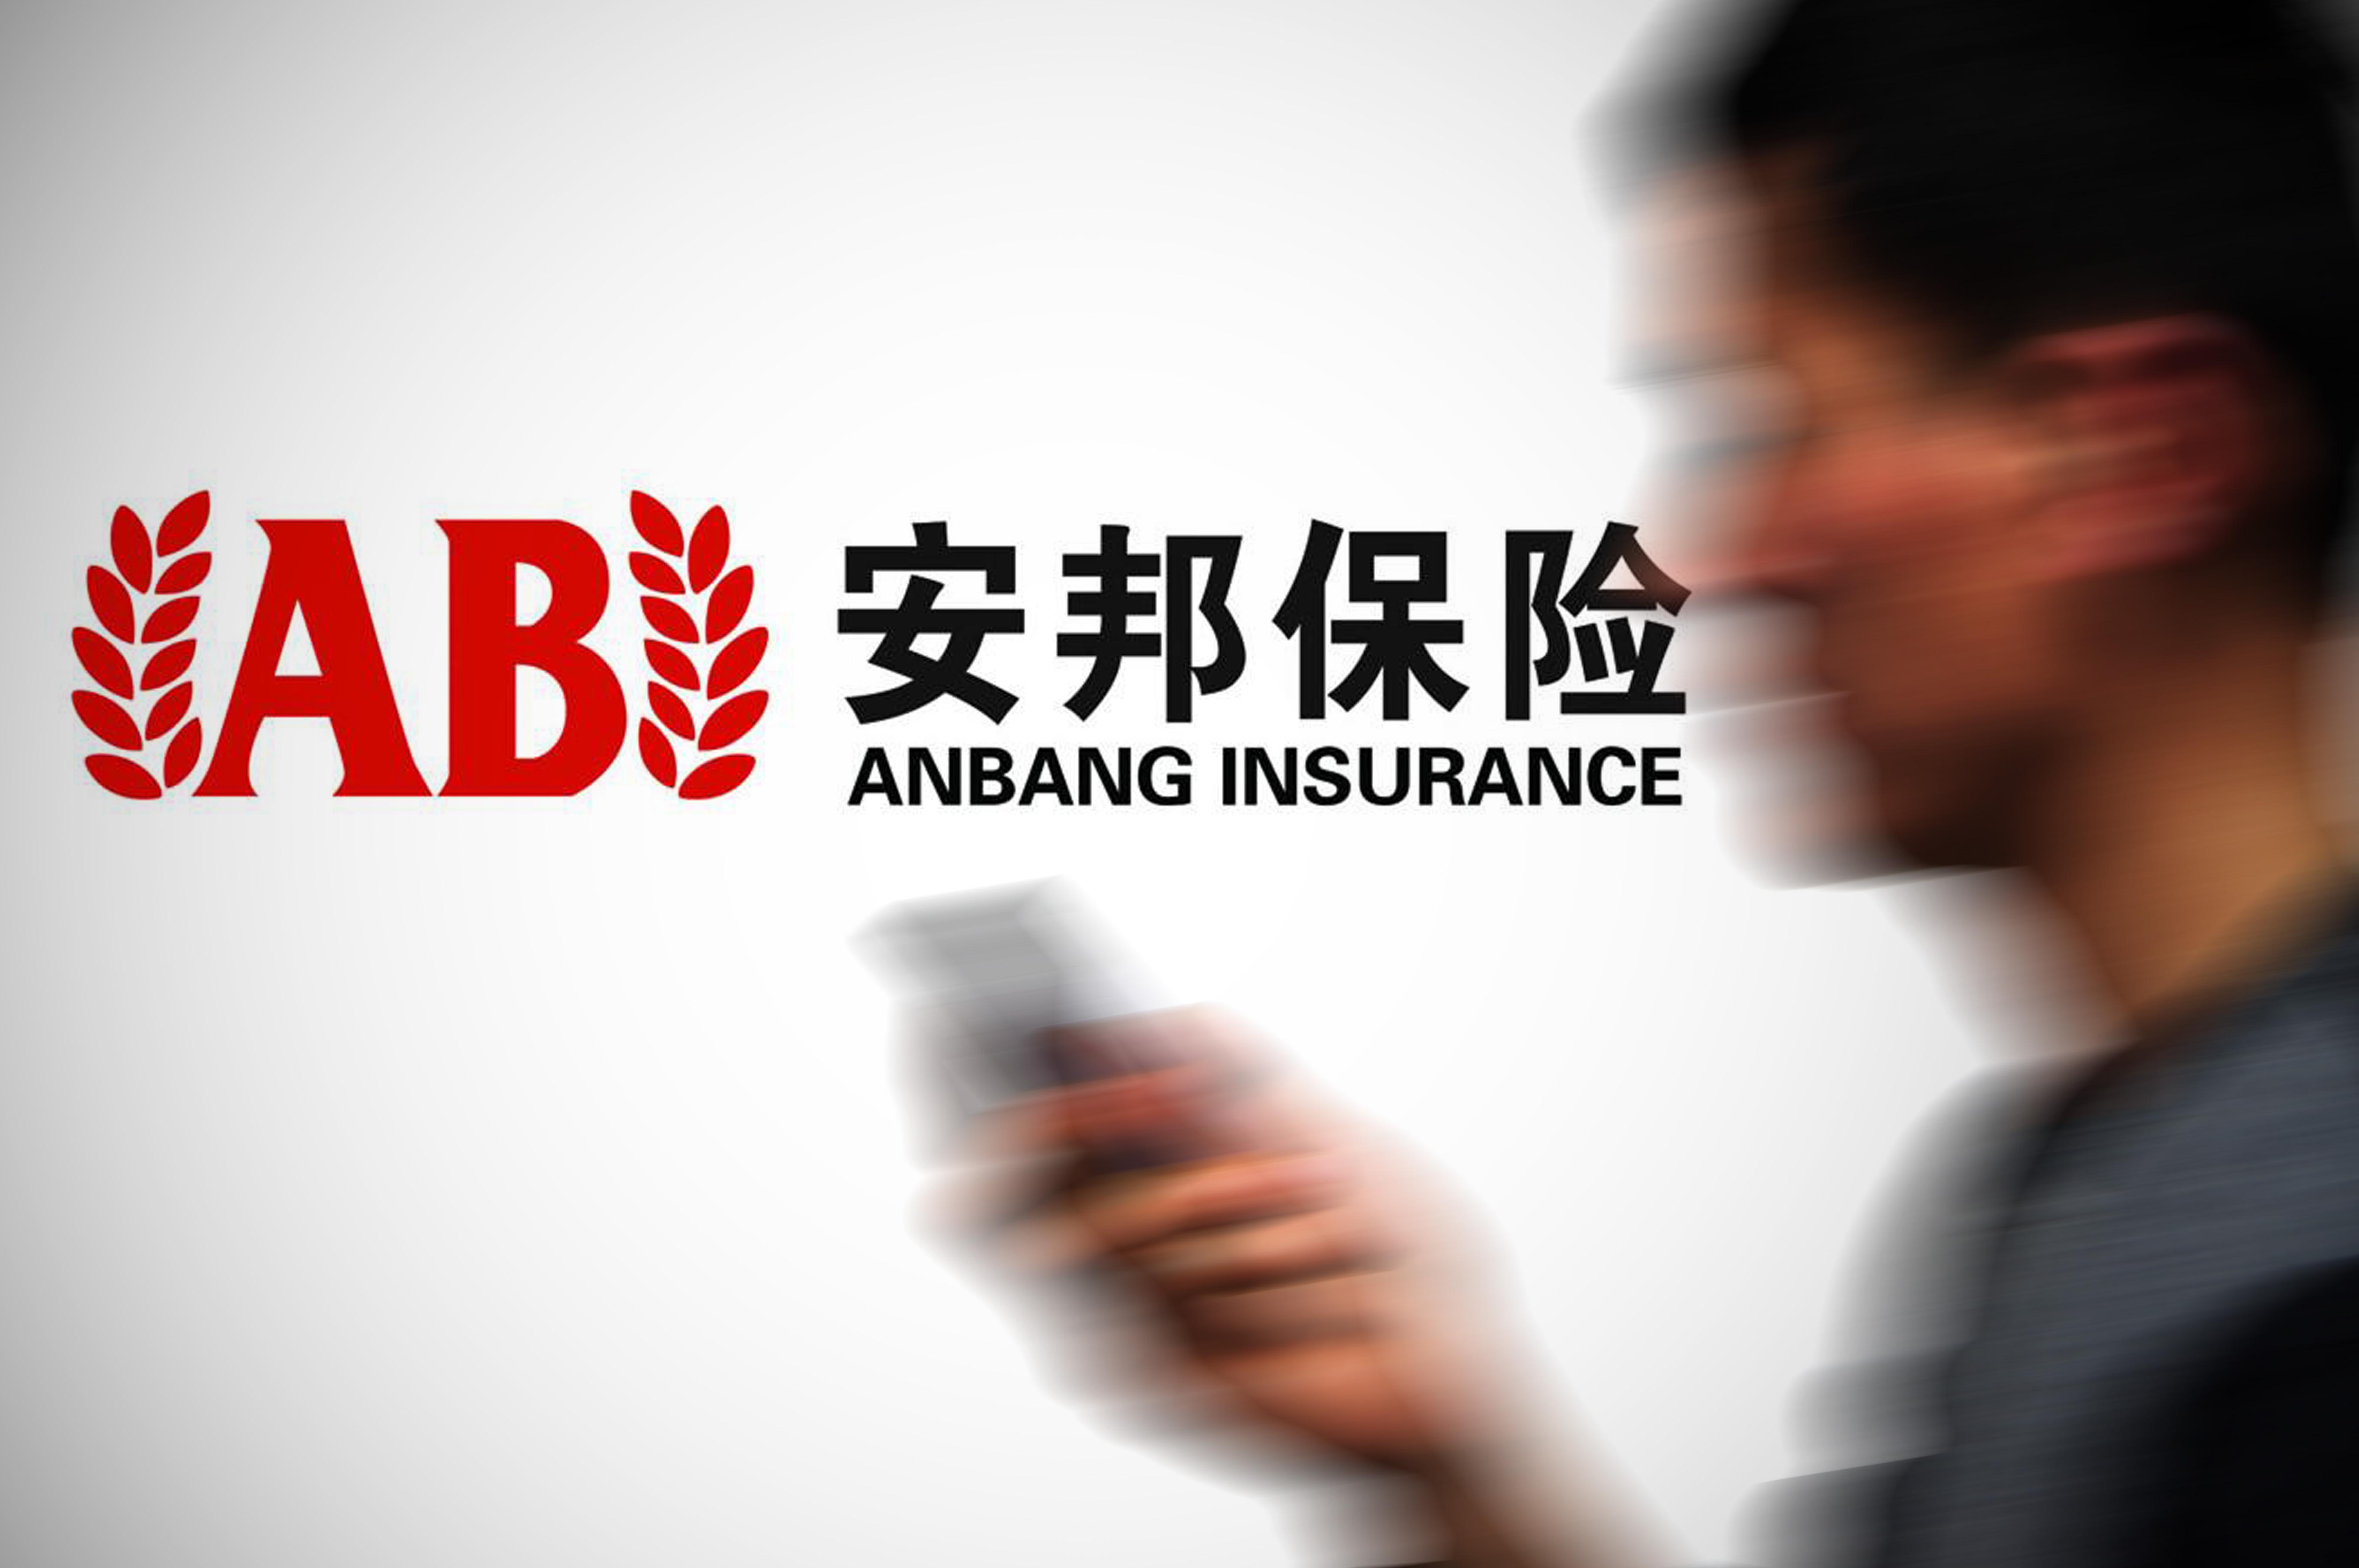 Anbang said near $2.3 billion property deal with Blackstone